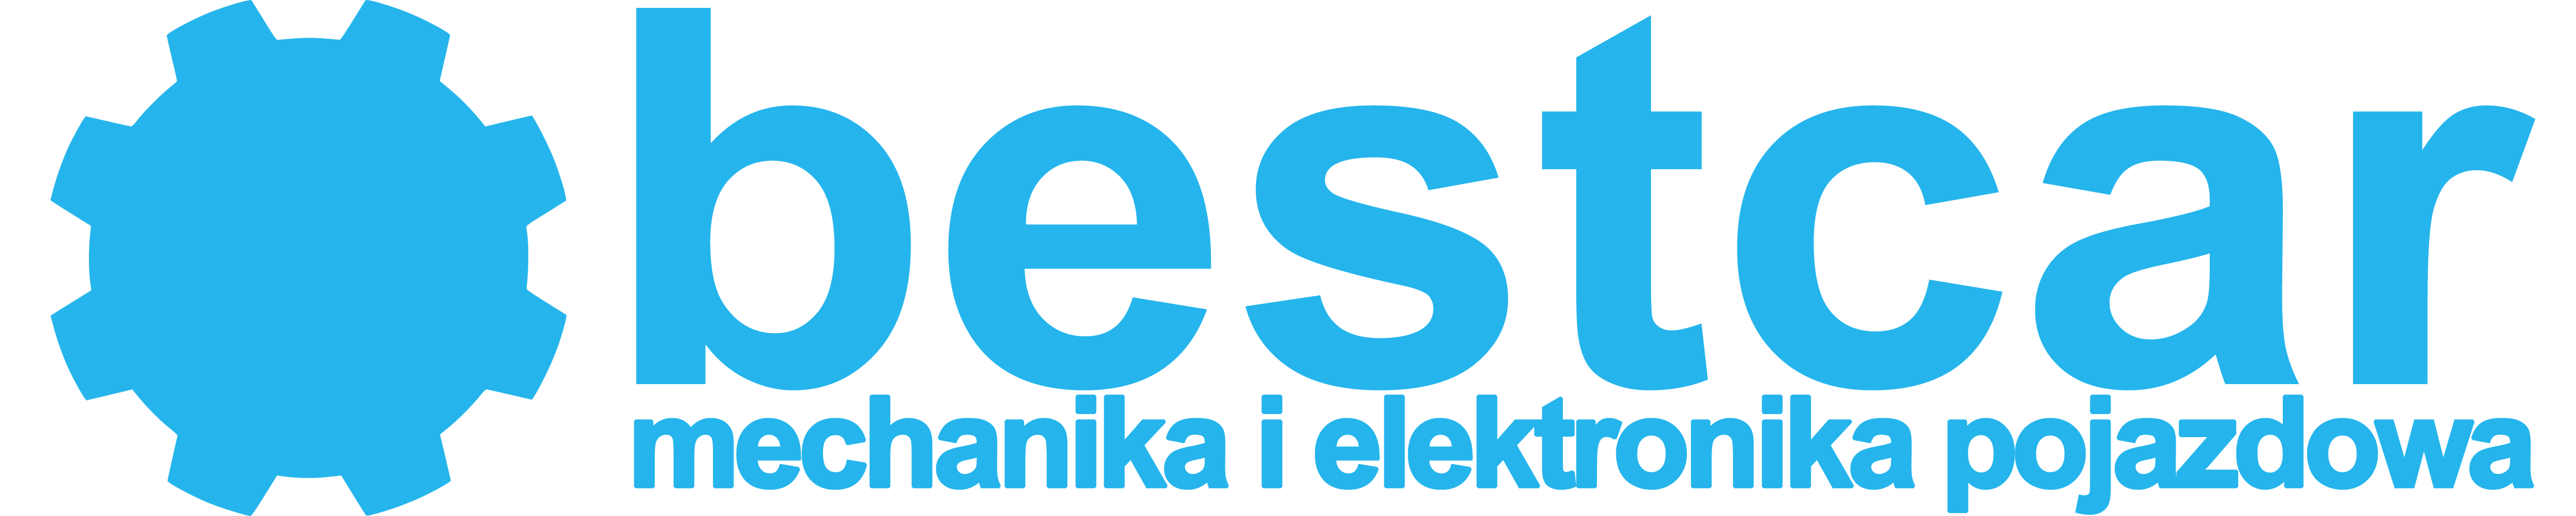 bestcar.pl